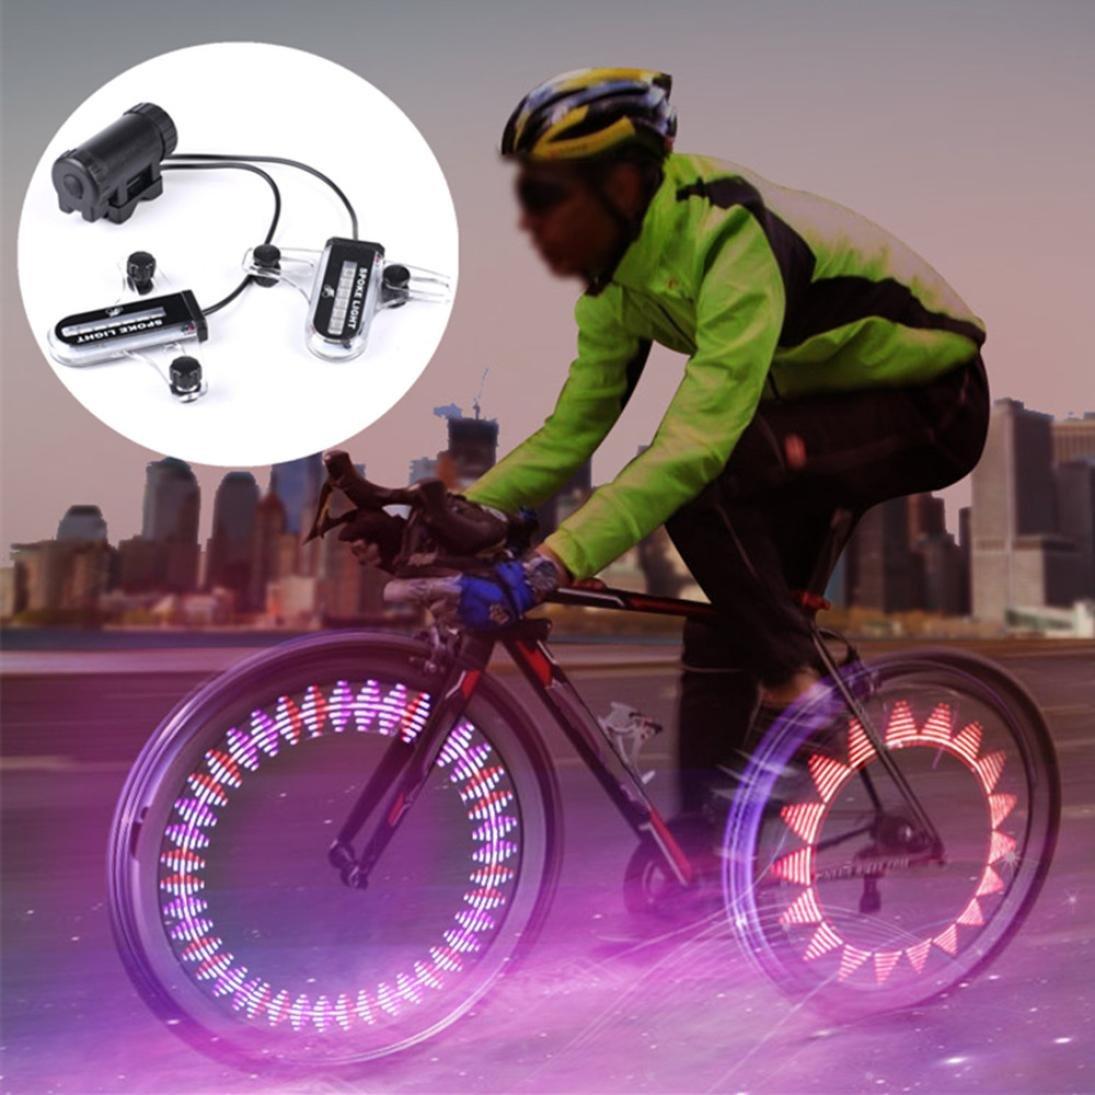 Fullfun Cycling Bicycle Bike Wheel Light,Signal Tire Decorative 2x14 LED Induction Spokes Light